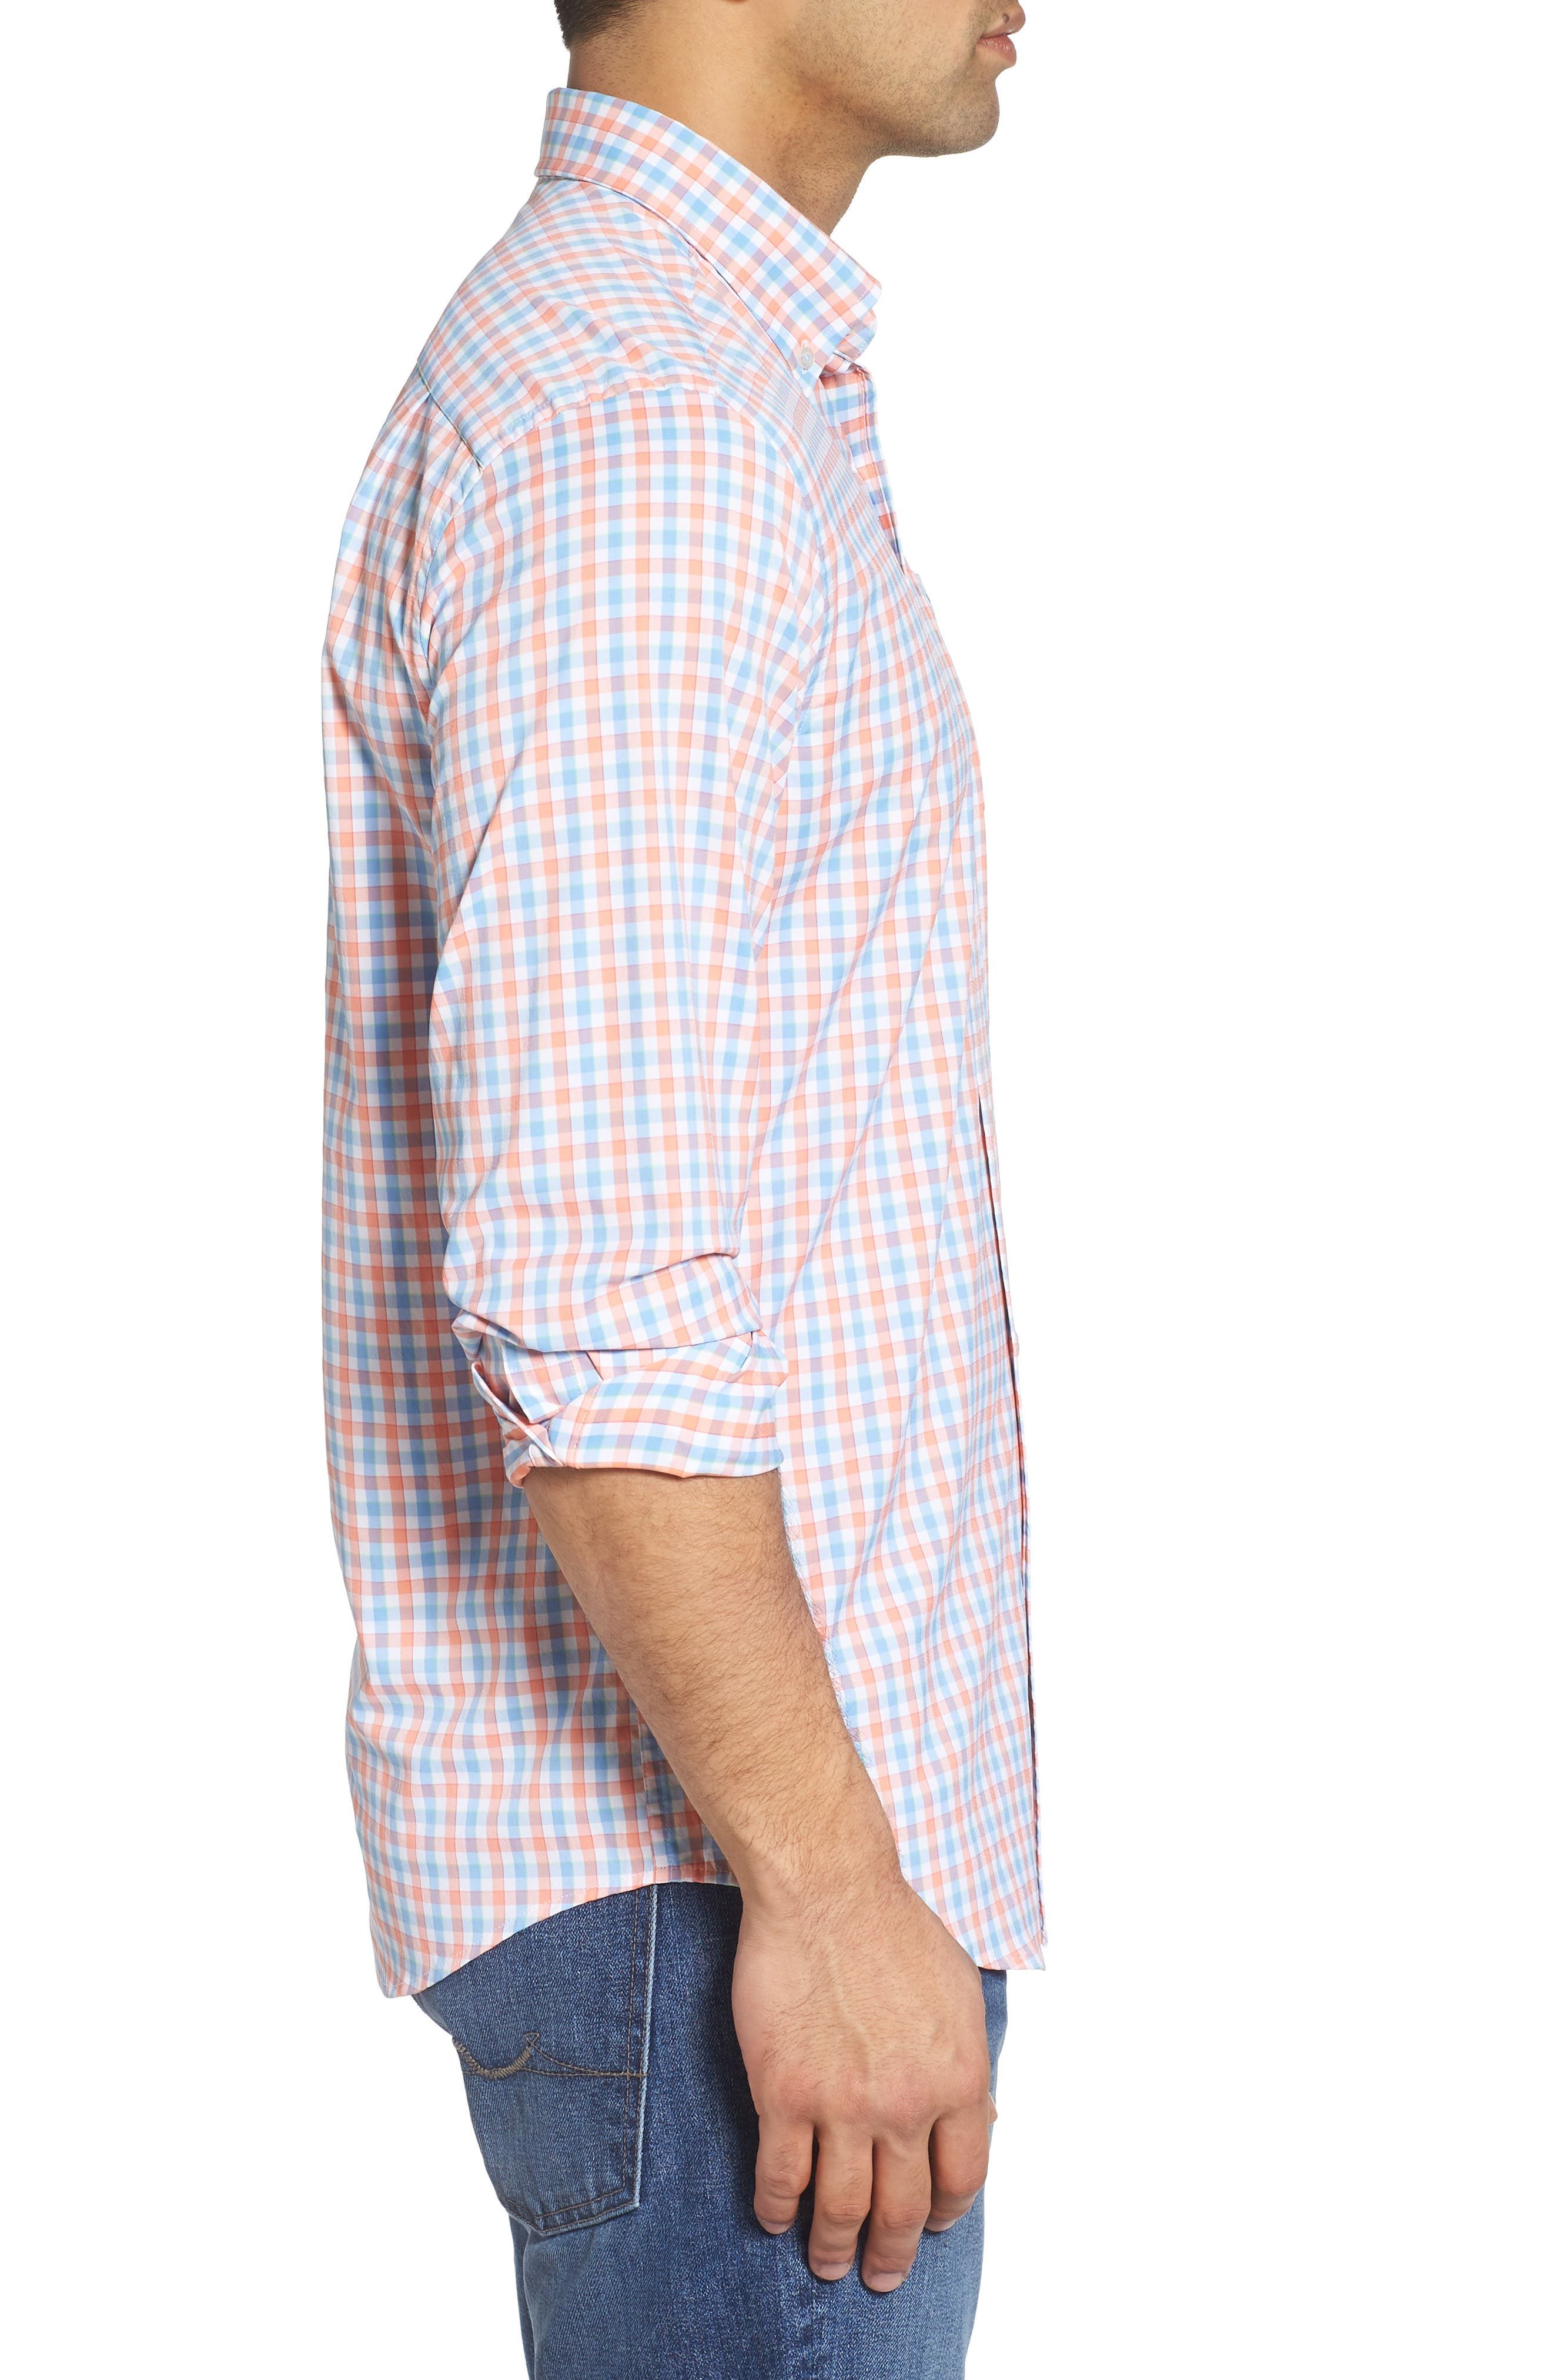 Market Square Regular Fit Stretch Check Sport Shirt,                             Alternate thumbnail 3, color,                             801